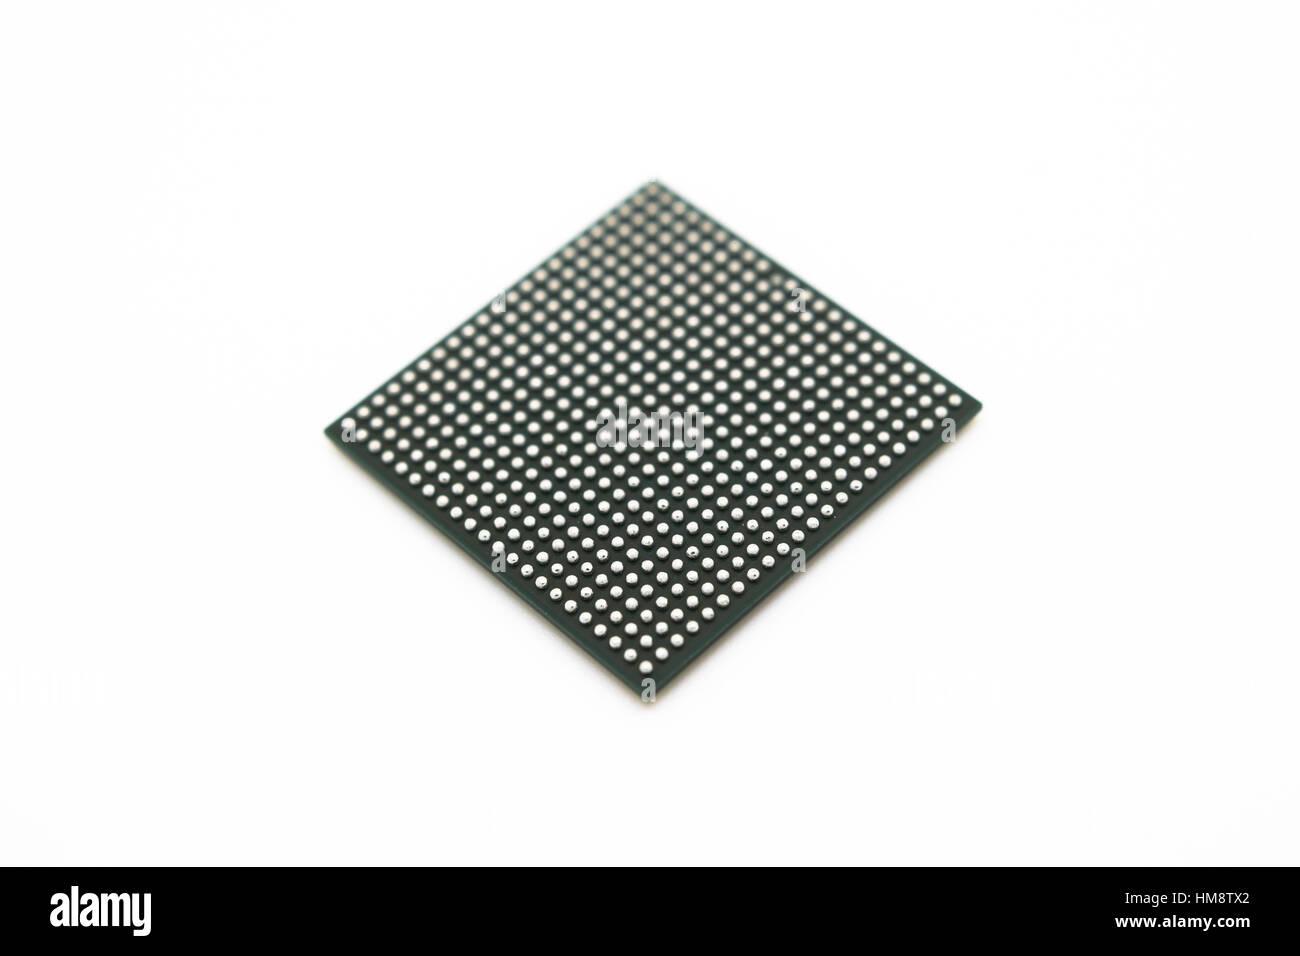 BGA package type integrated circuit Stock Photo: 132960858 - Alamy